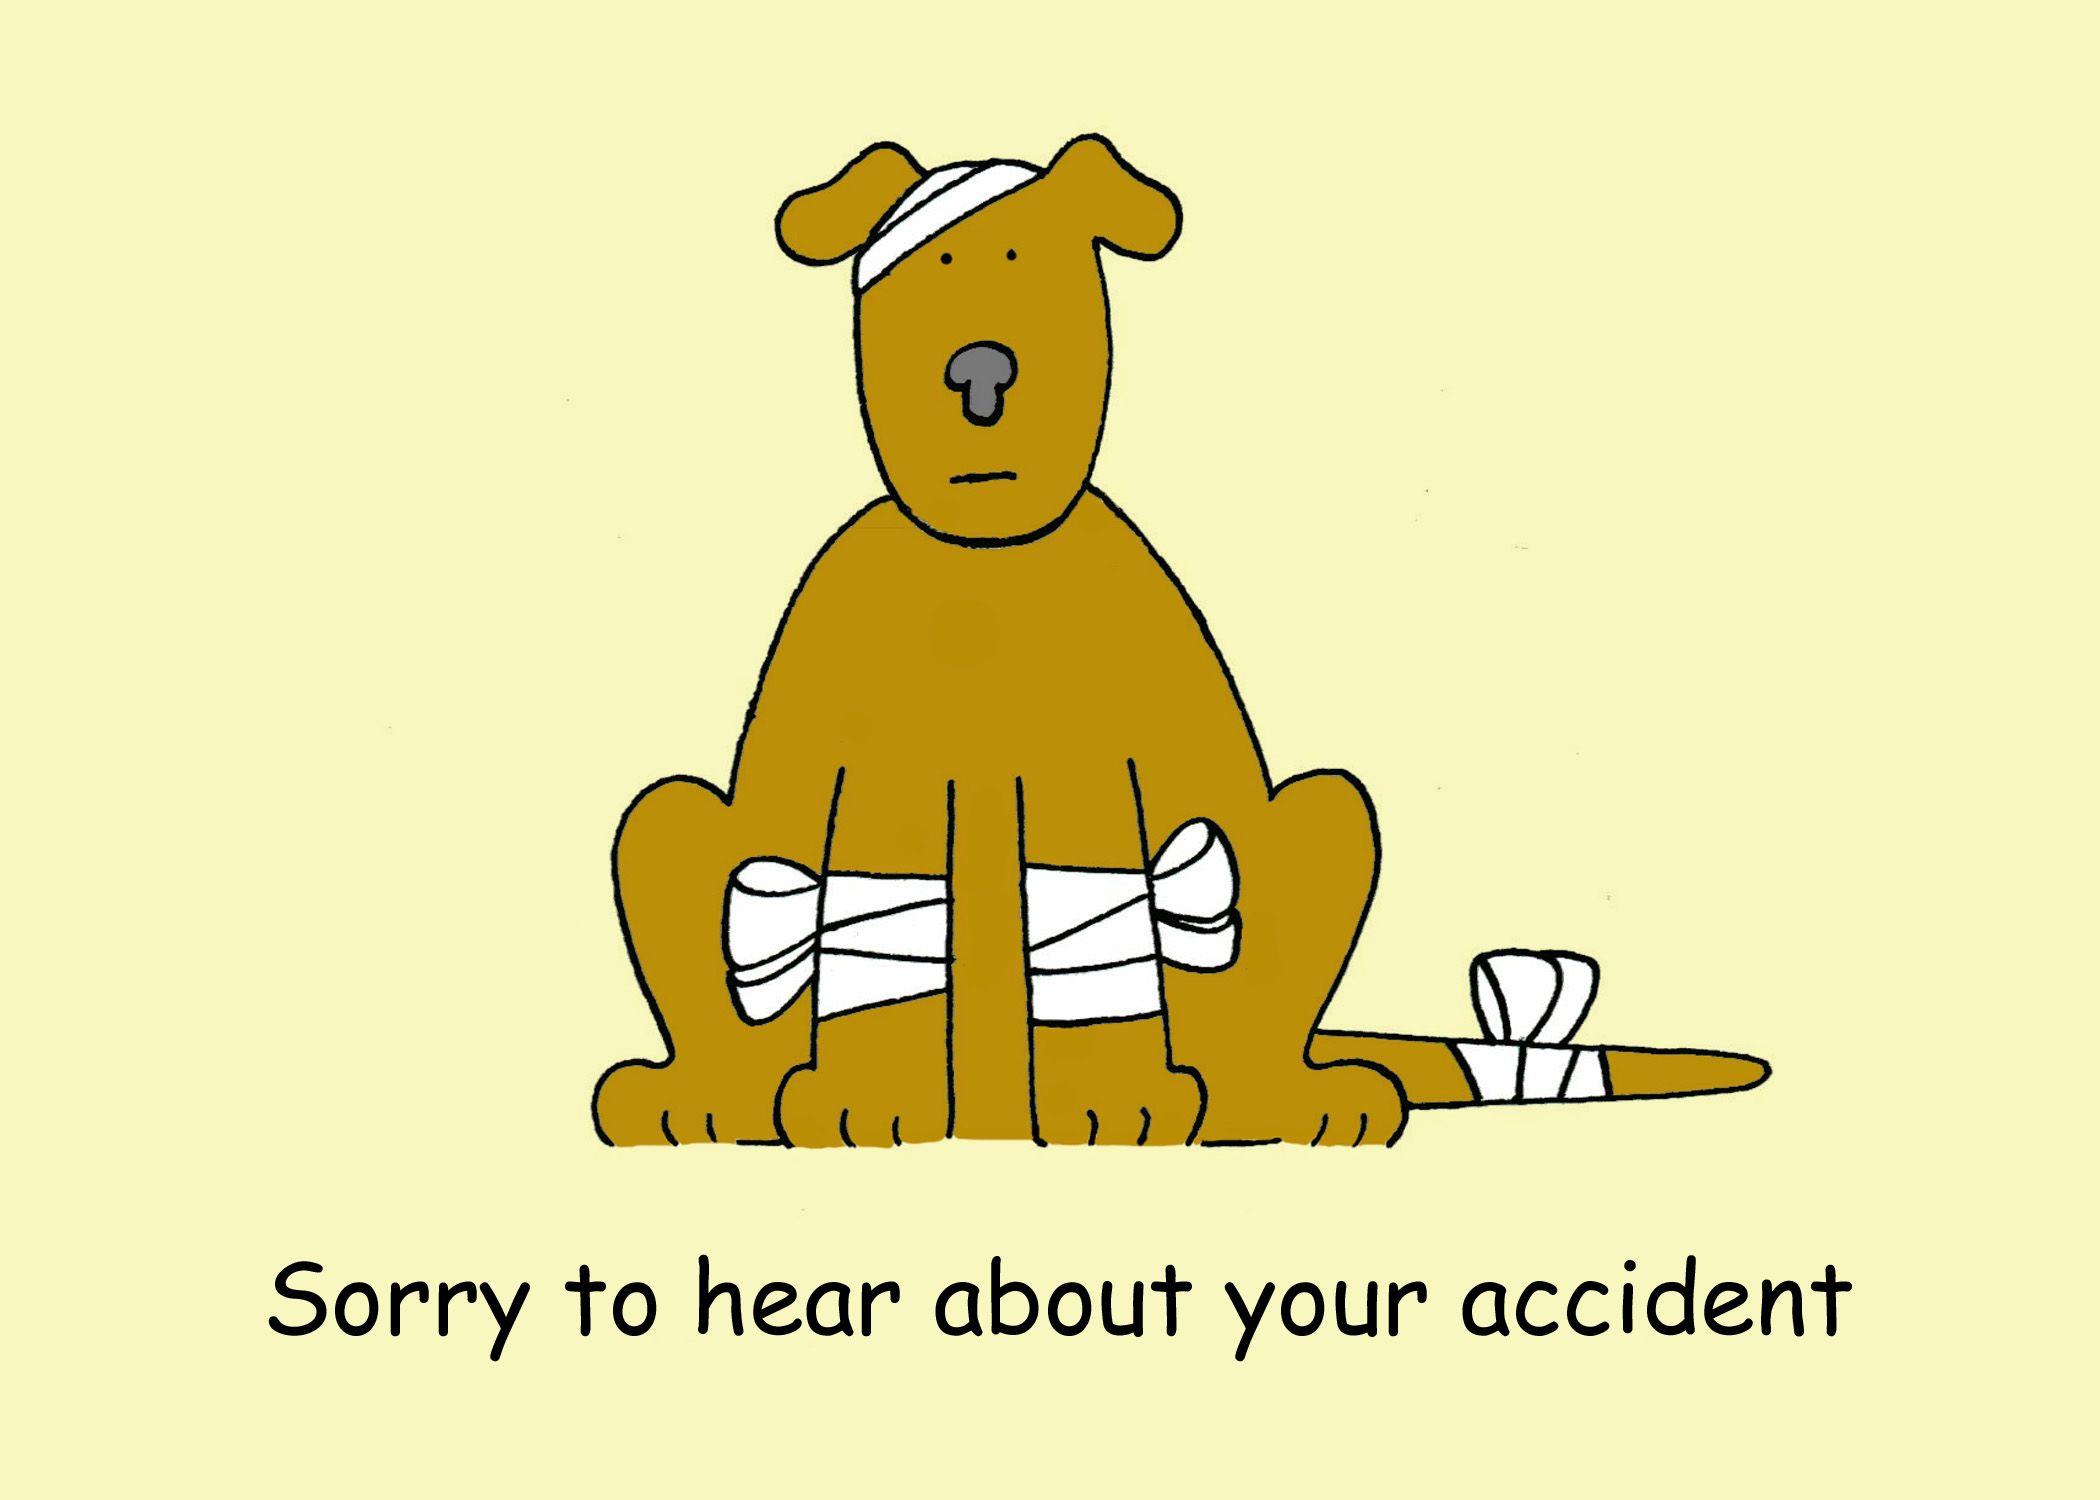 Funny minion quotes image by julia barrett in 2020 puppy